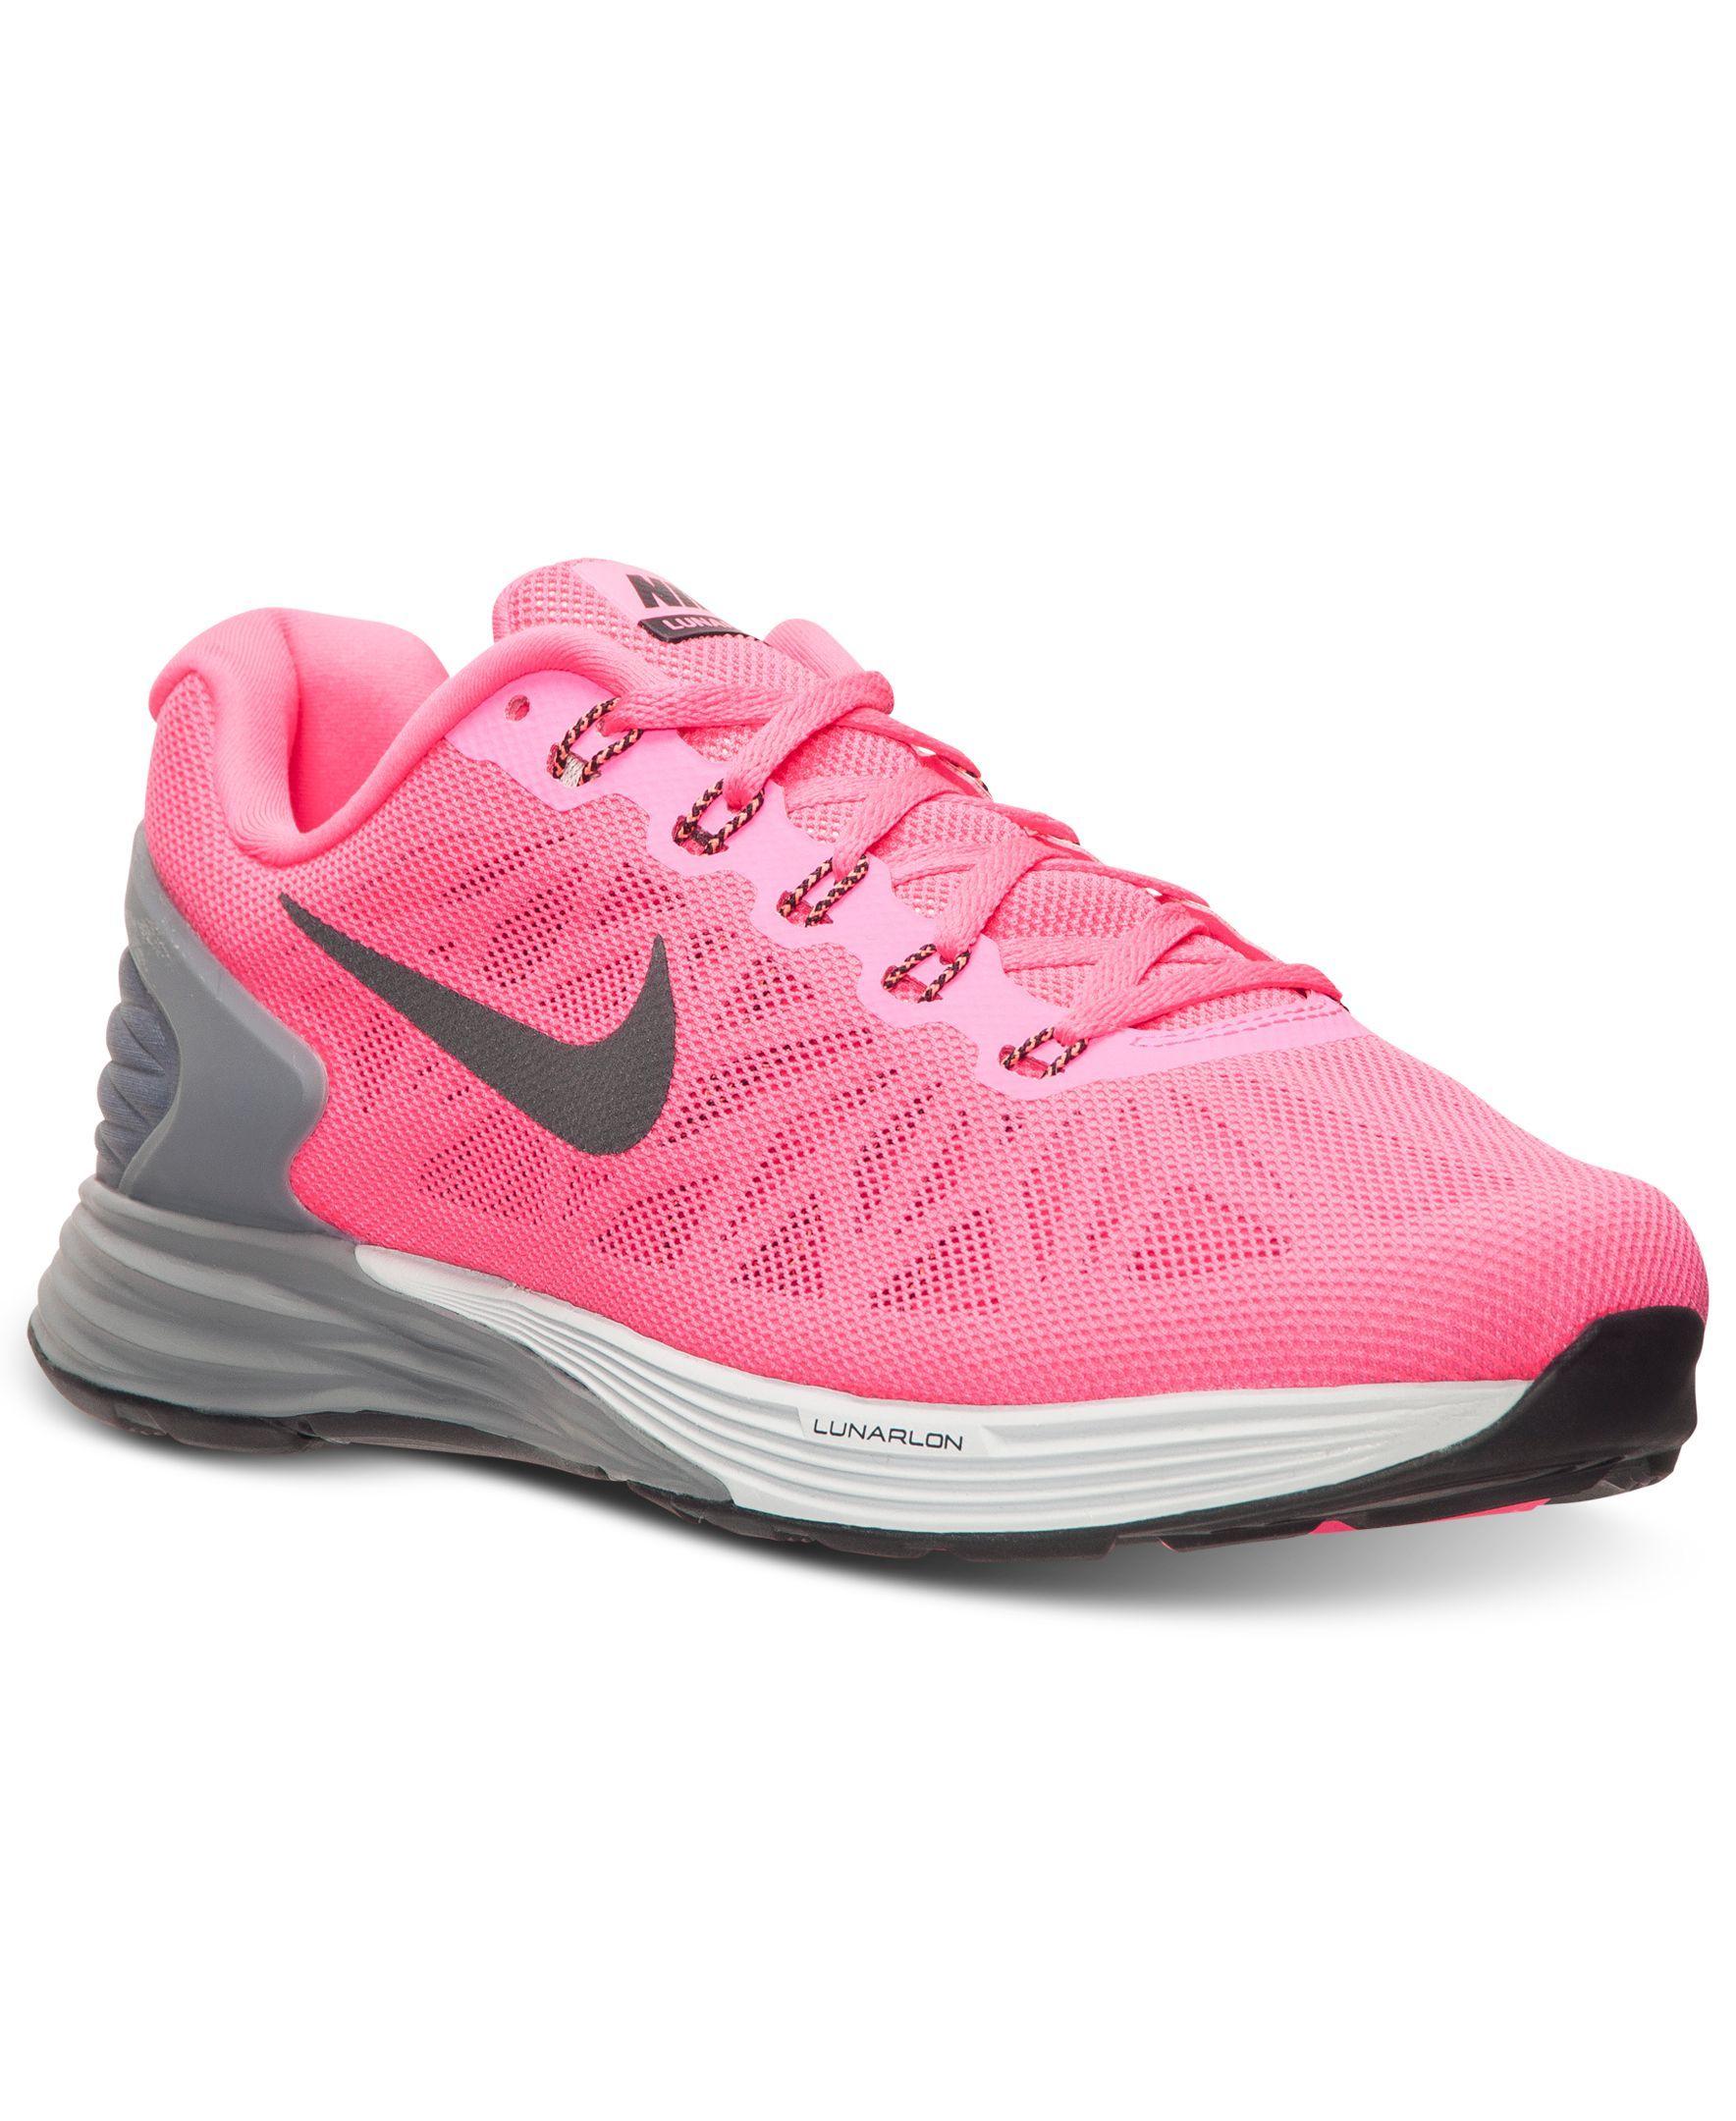 Nike Women's LunarGlide 6 Running Sneakers from Finish